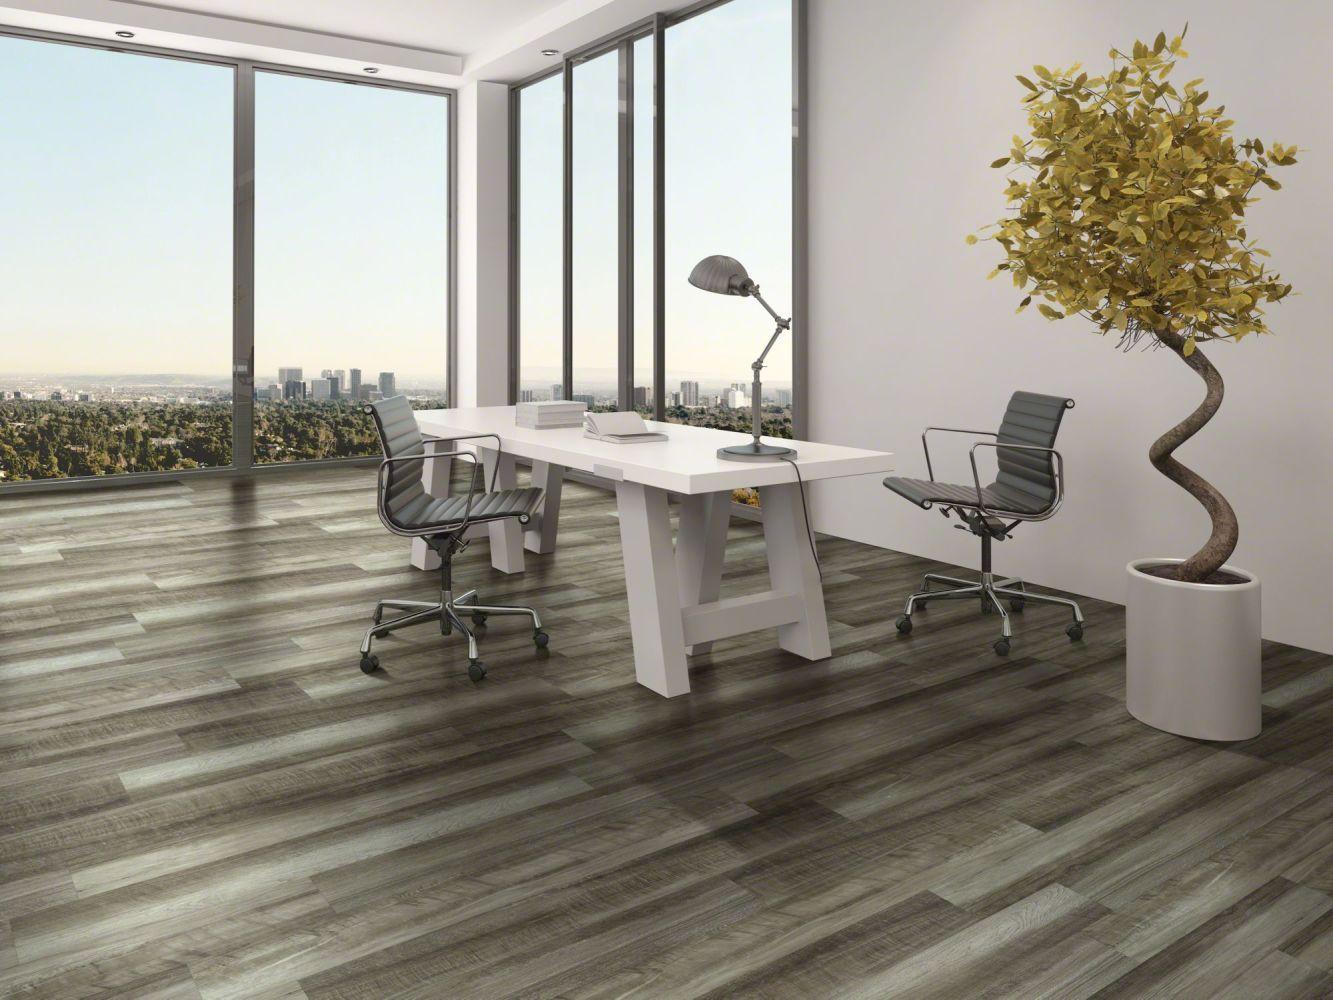 Shaw Floors 5th And Main Designation Macadum 00591_5M225